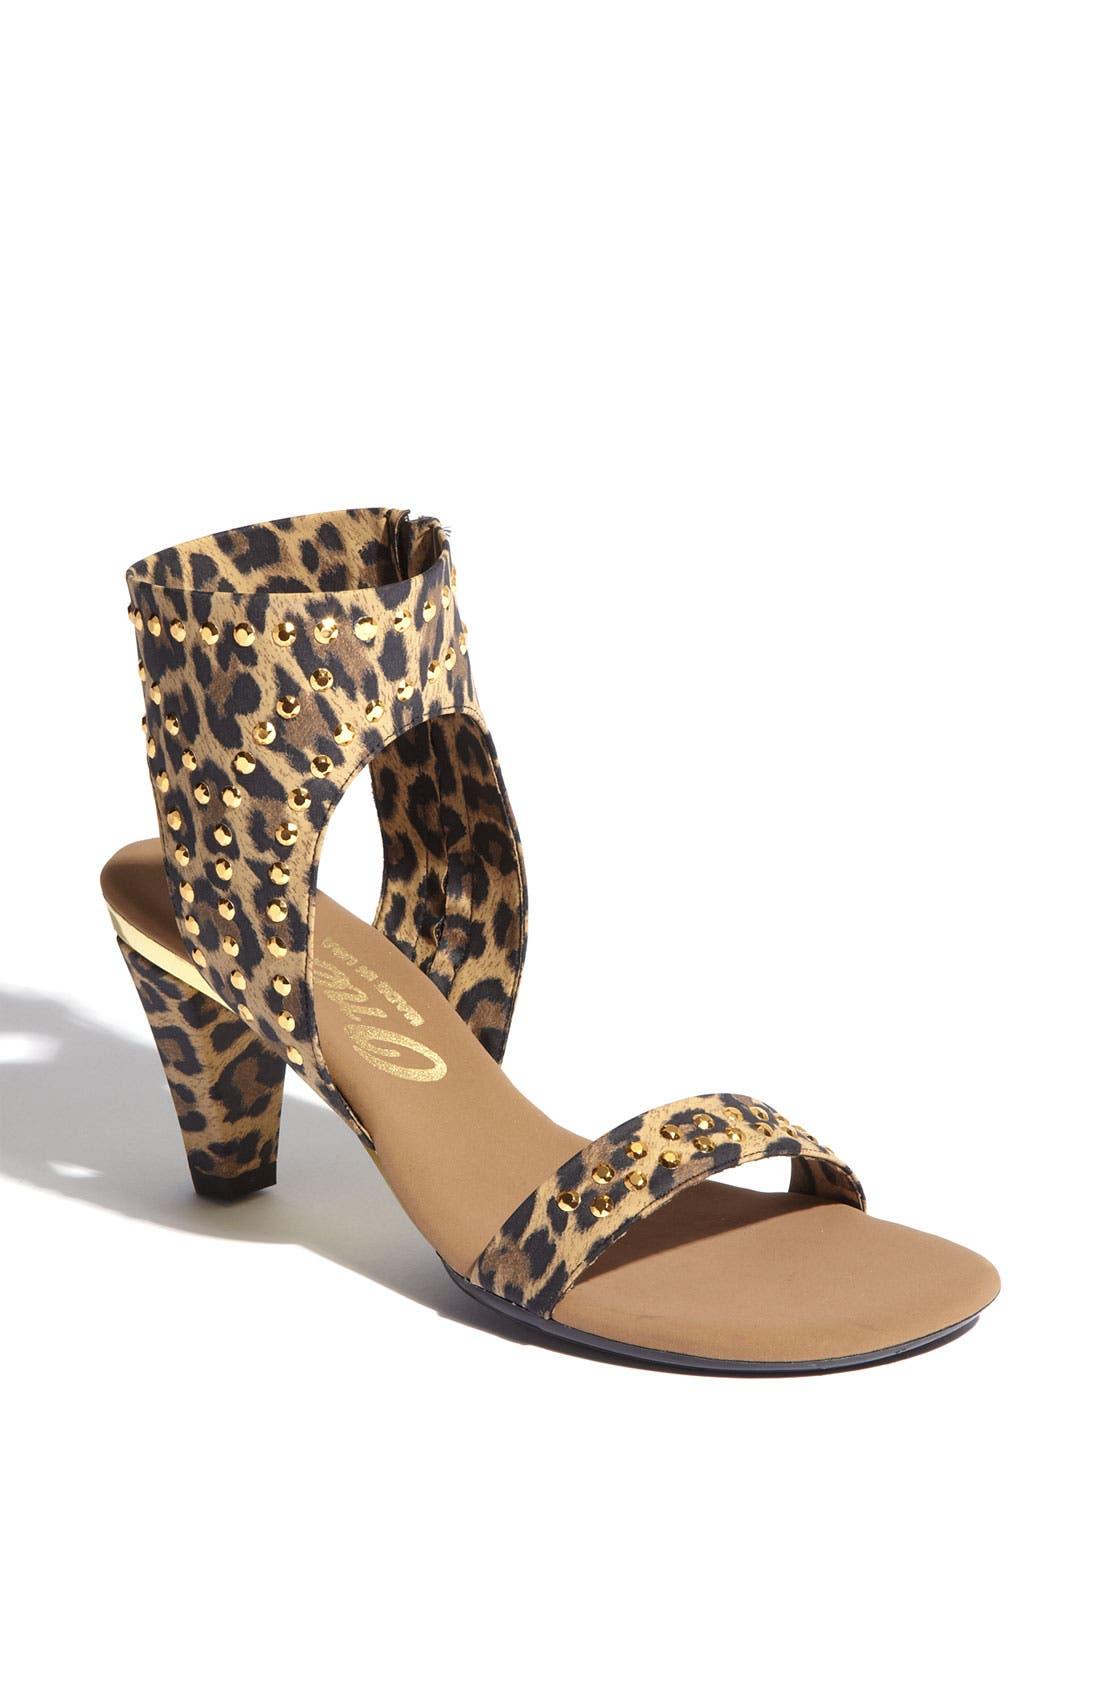 Alternate Image 1 Selected - Onex 'Showgirl' Sandal